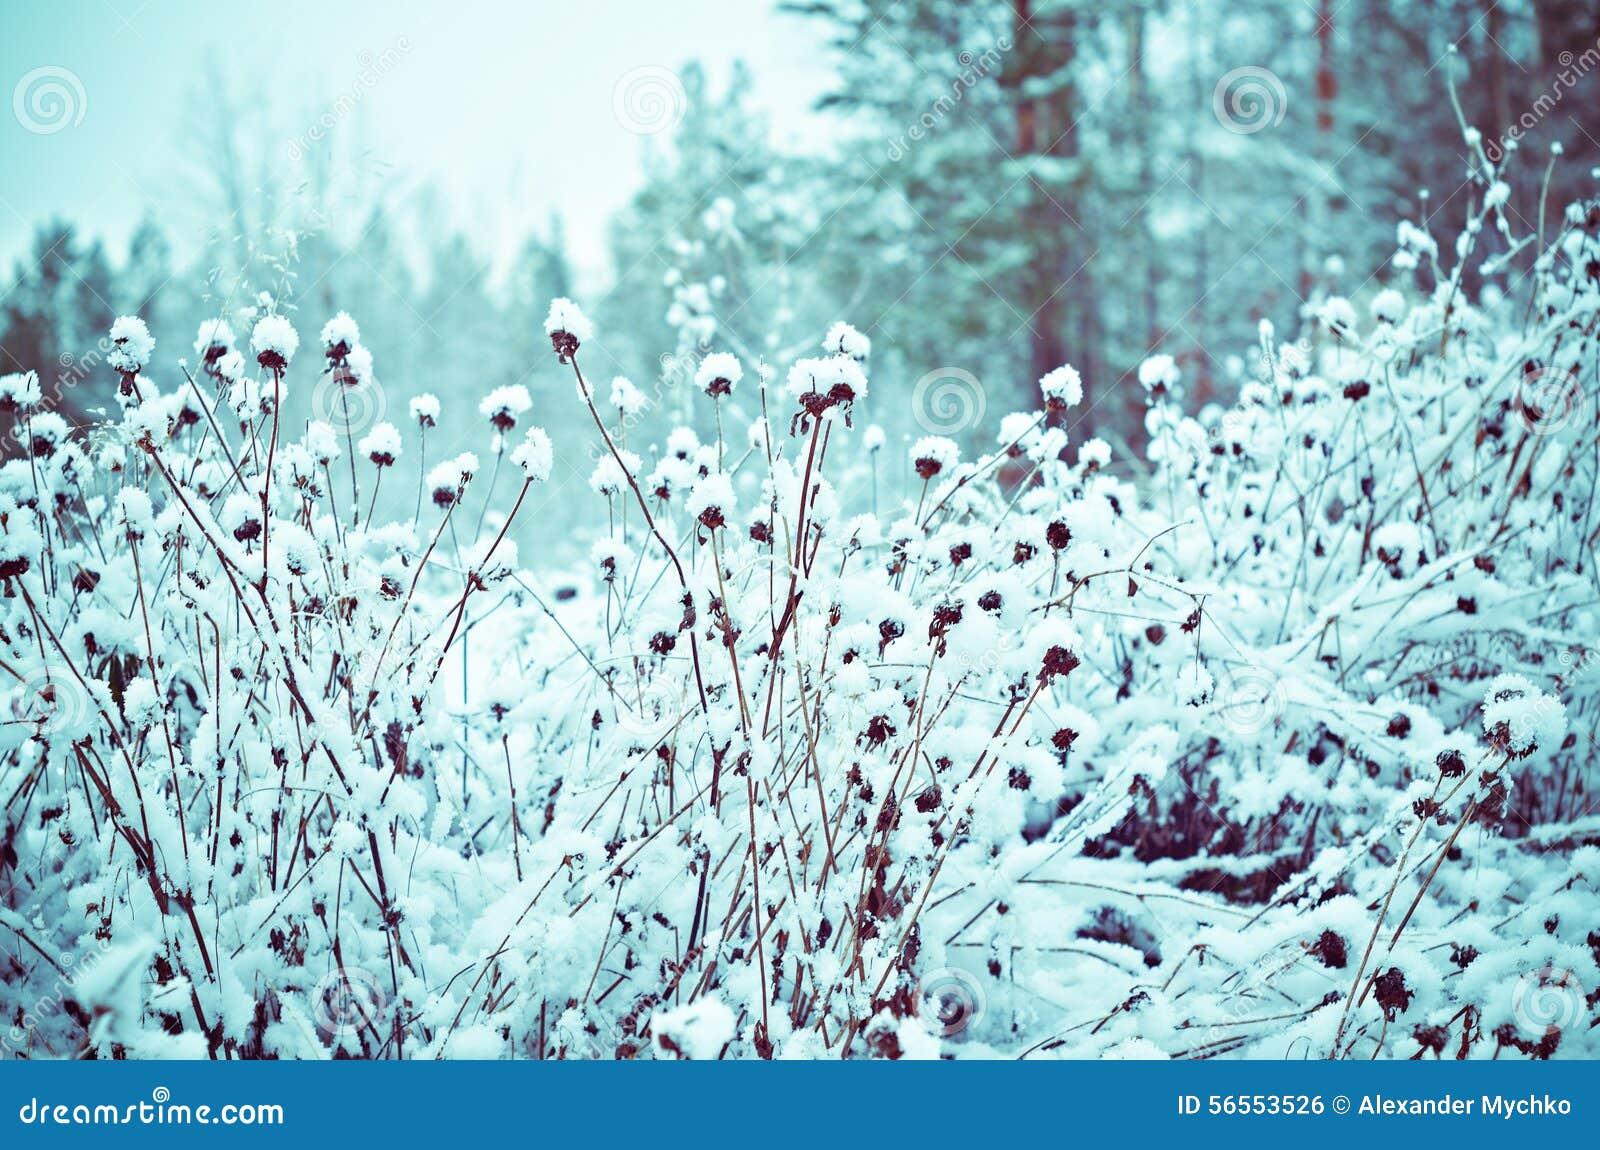 Download καλυμμένα όρη σπιτιών ελβετικά χειμερινά δάση χιονιού σκηνής μικρά Στοκ Εικόνες - εικόνα από βακκινίων, κάλυψη: 56553526